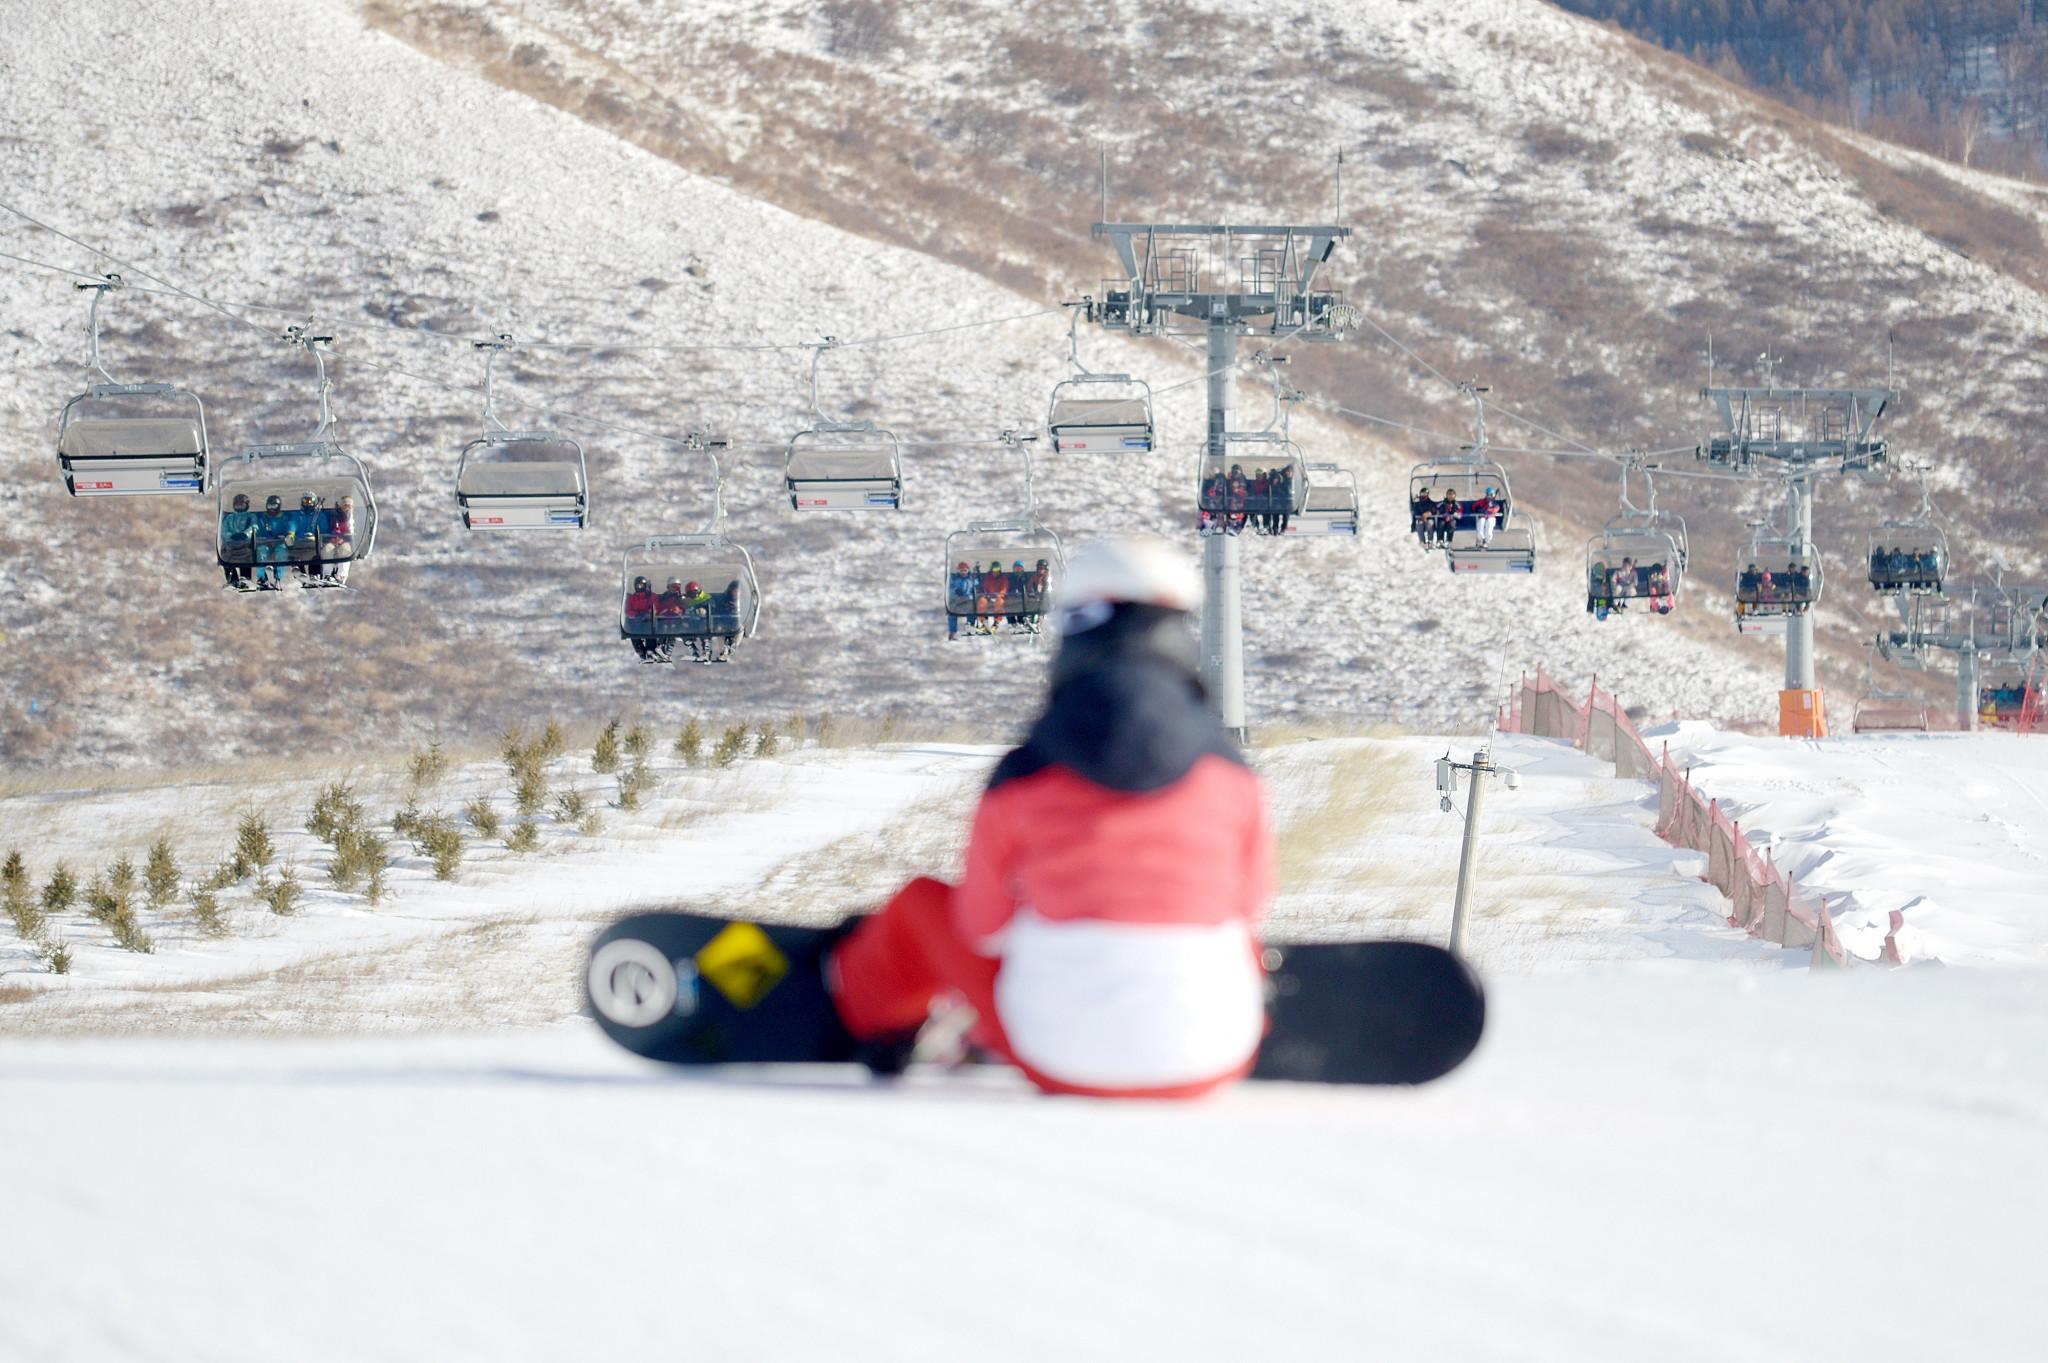 Zhangjiakou will host the World Championships next year ©Getty Images